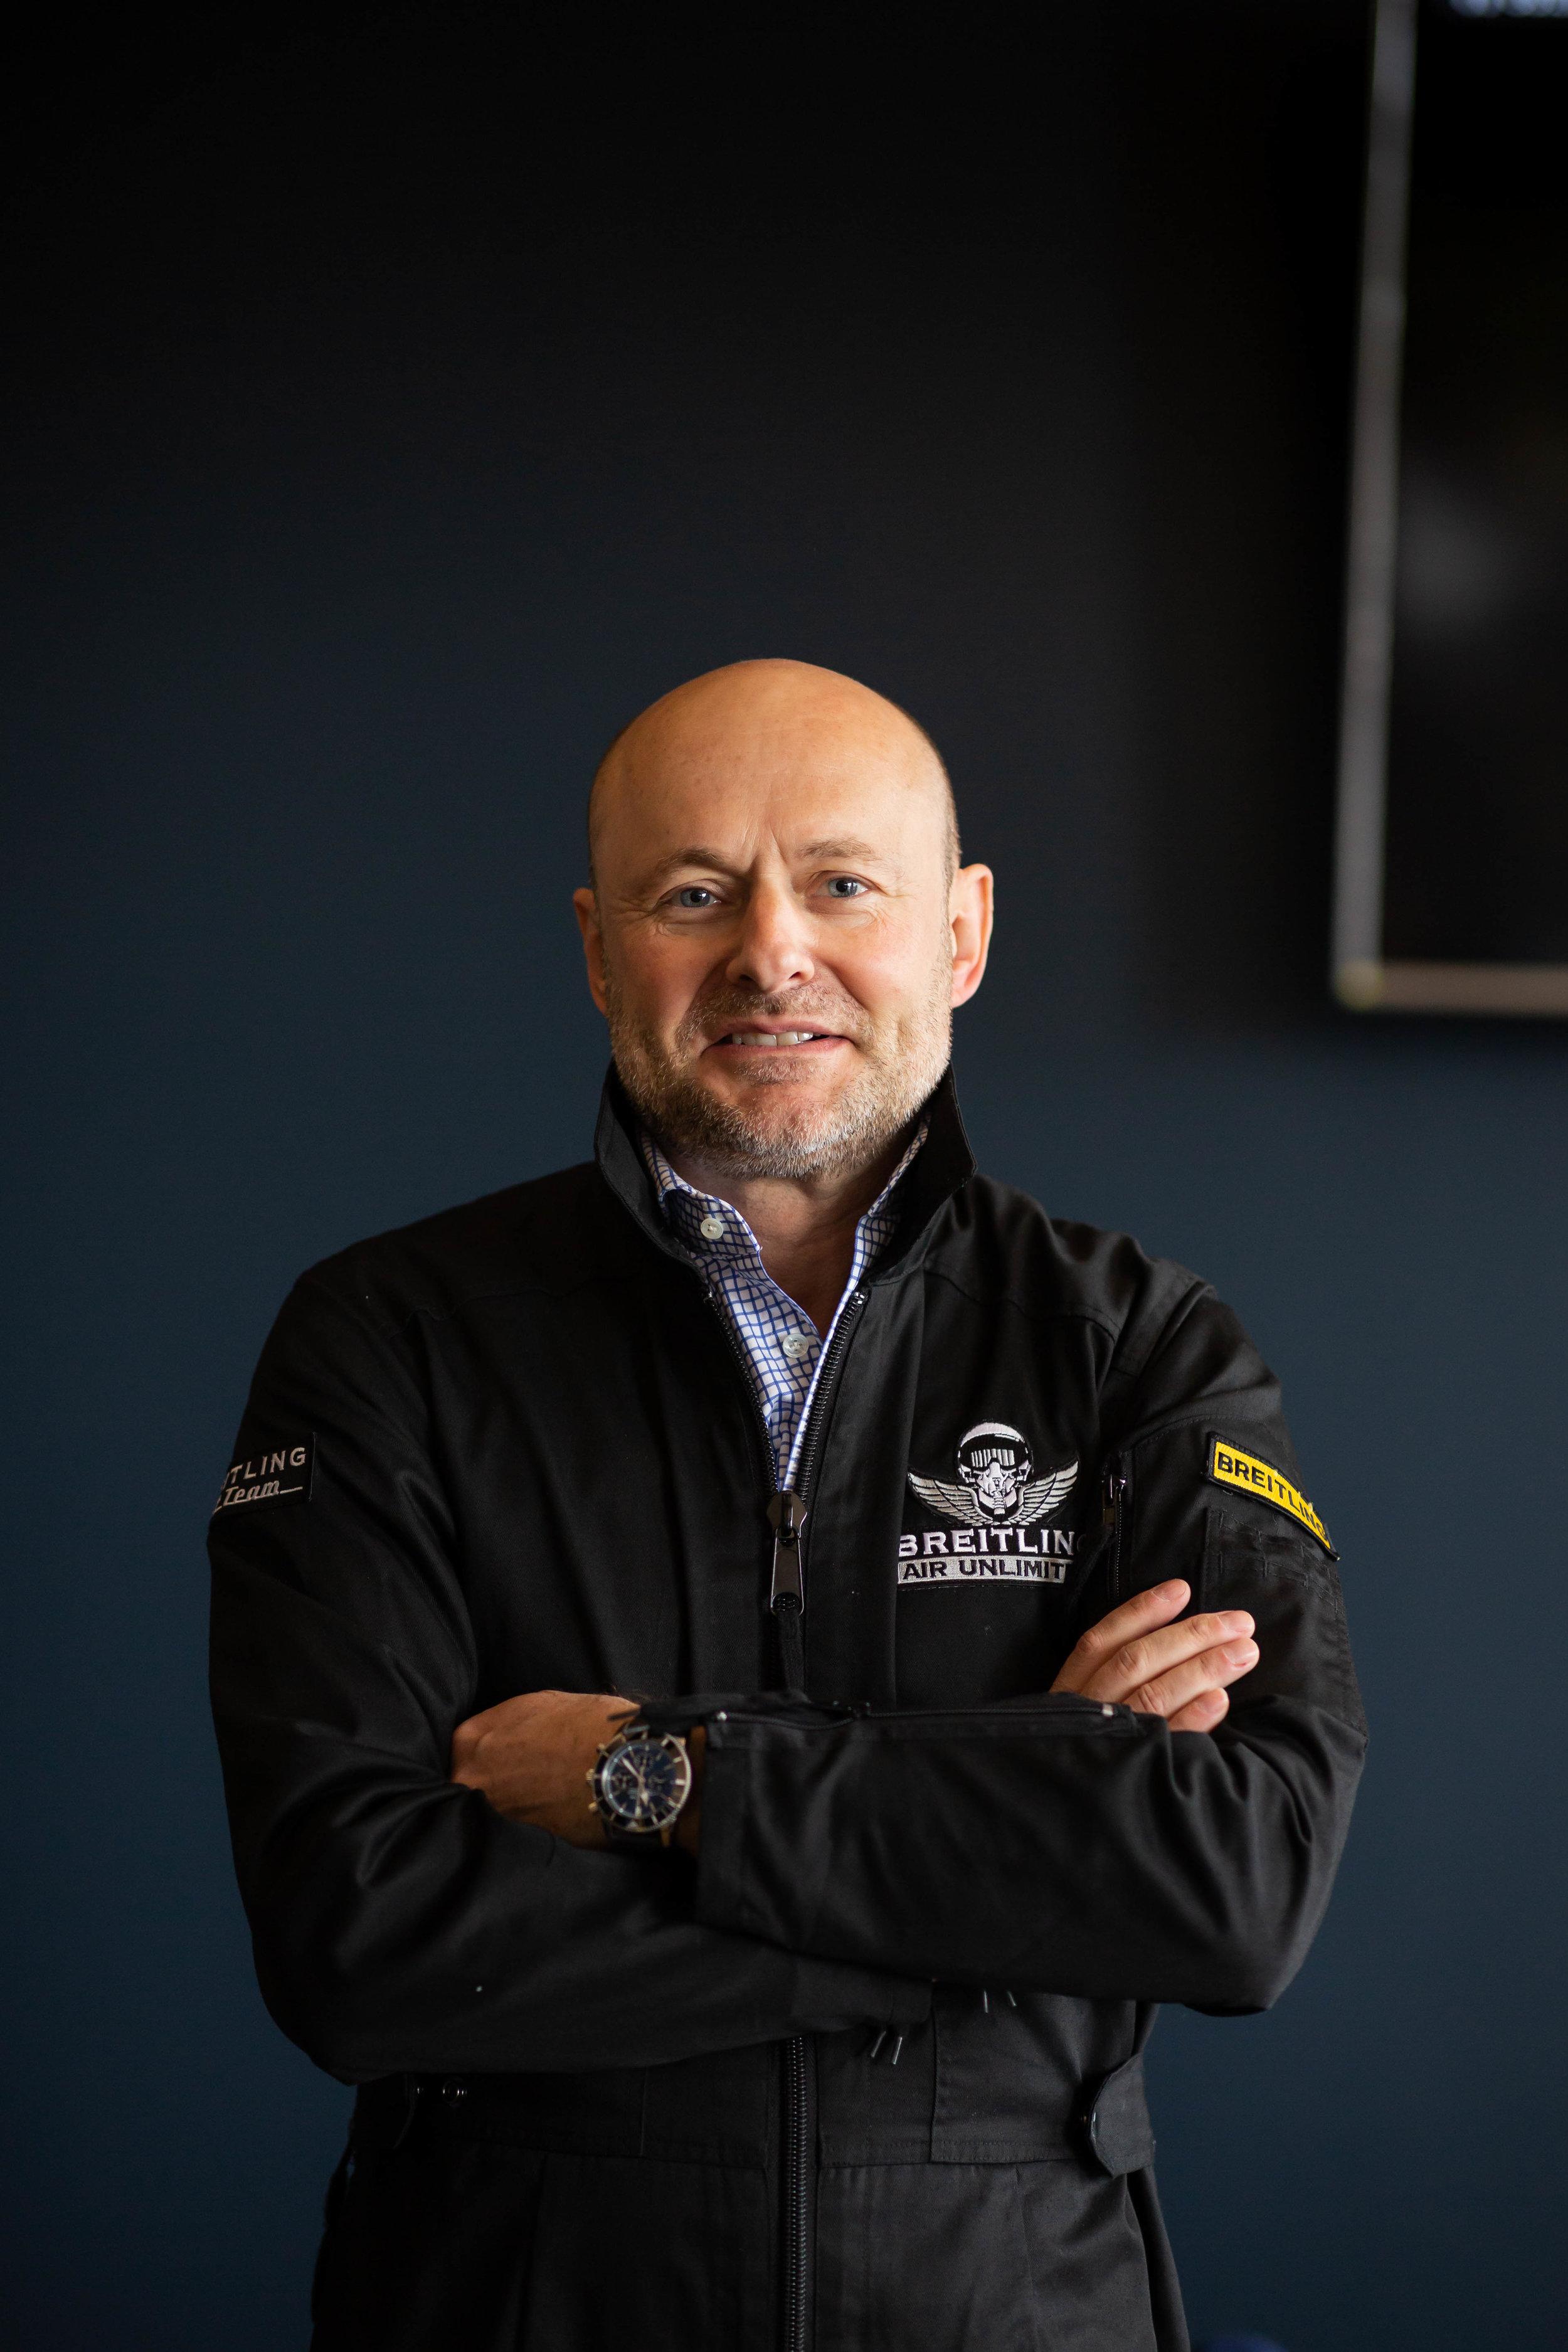 Mr Georges Kern - Breitling CEO